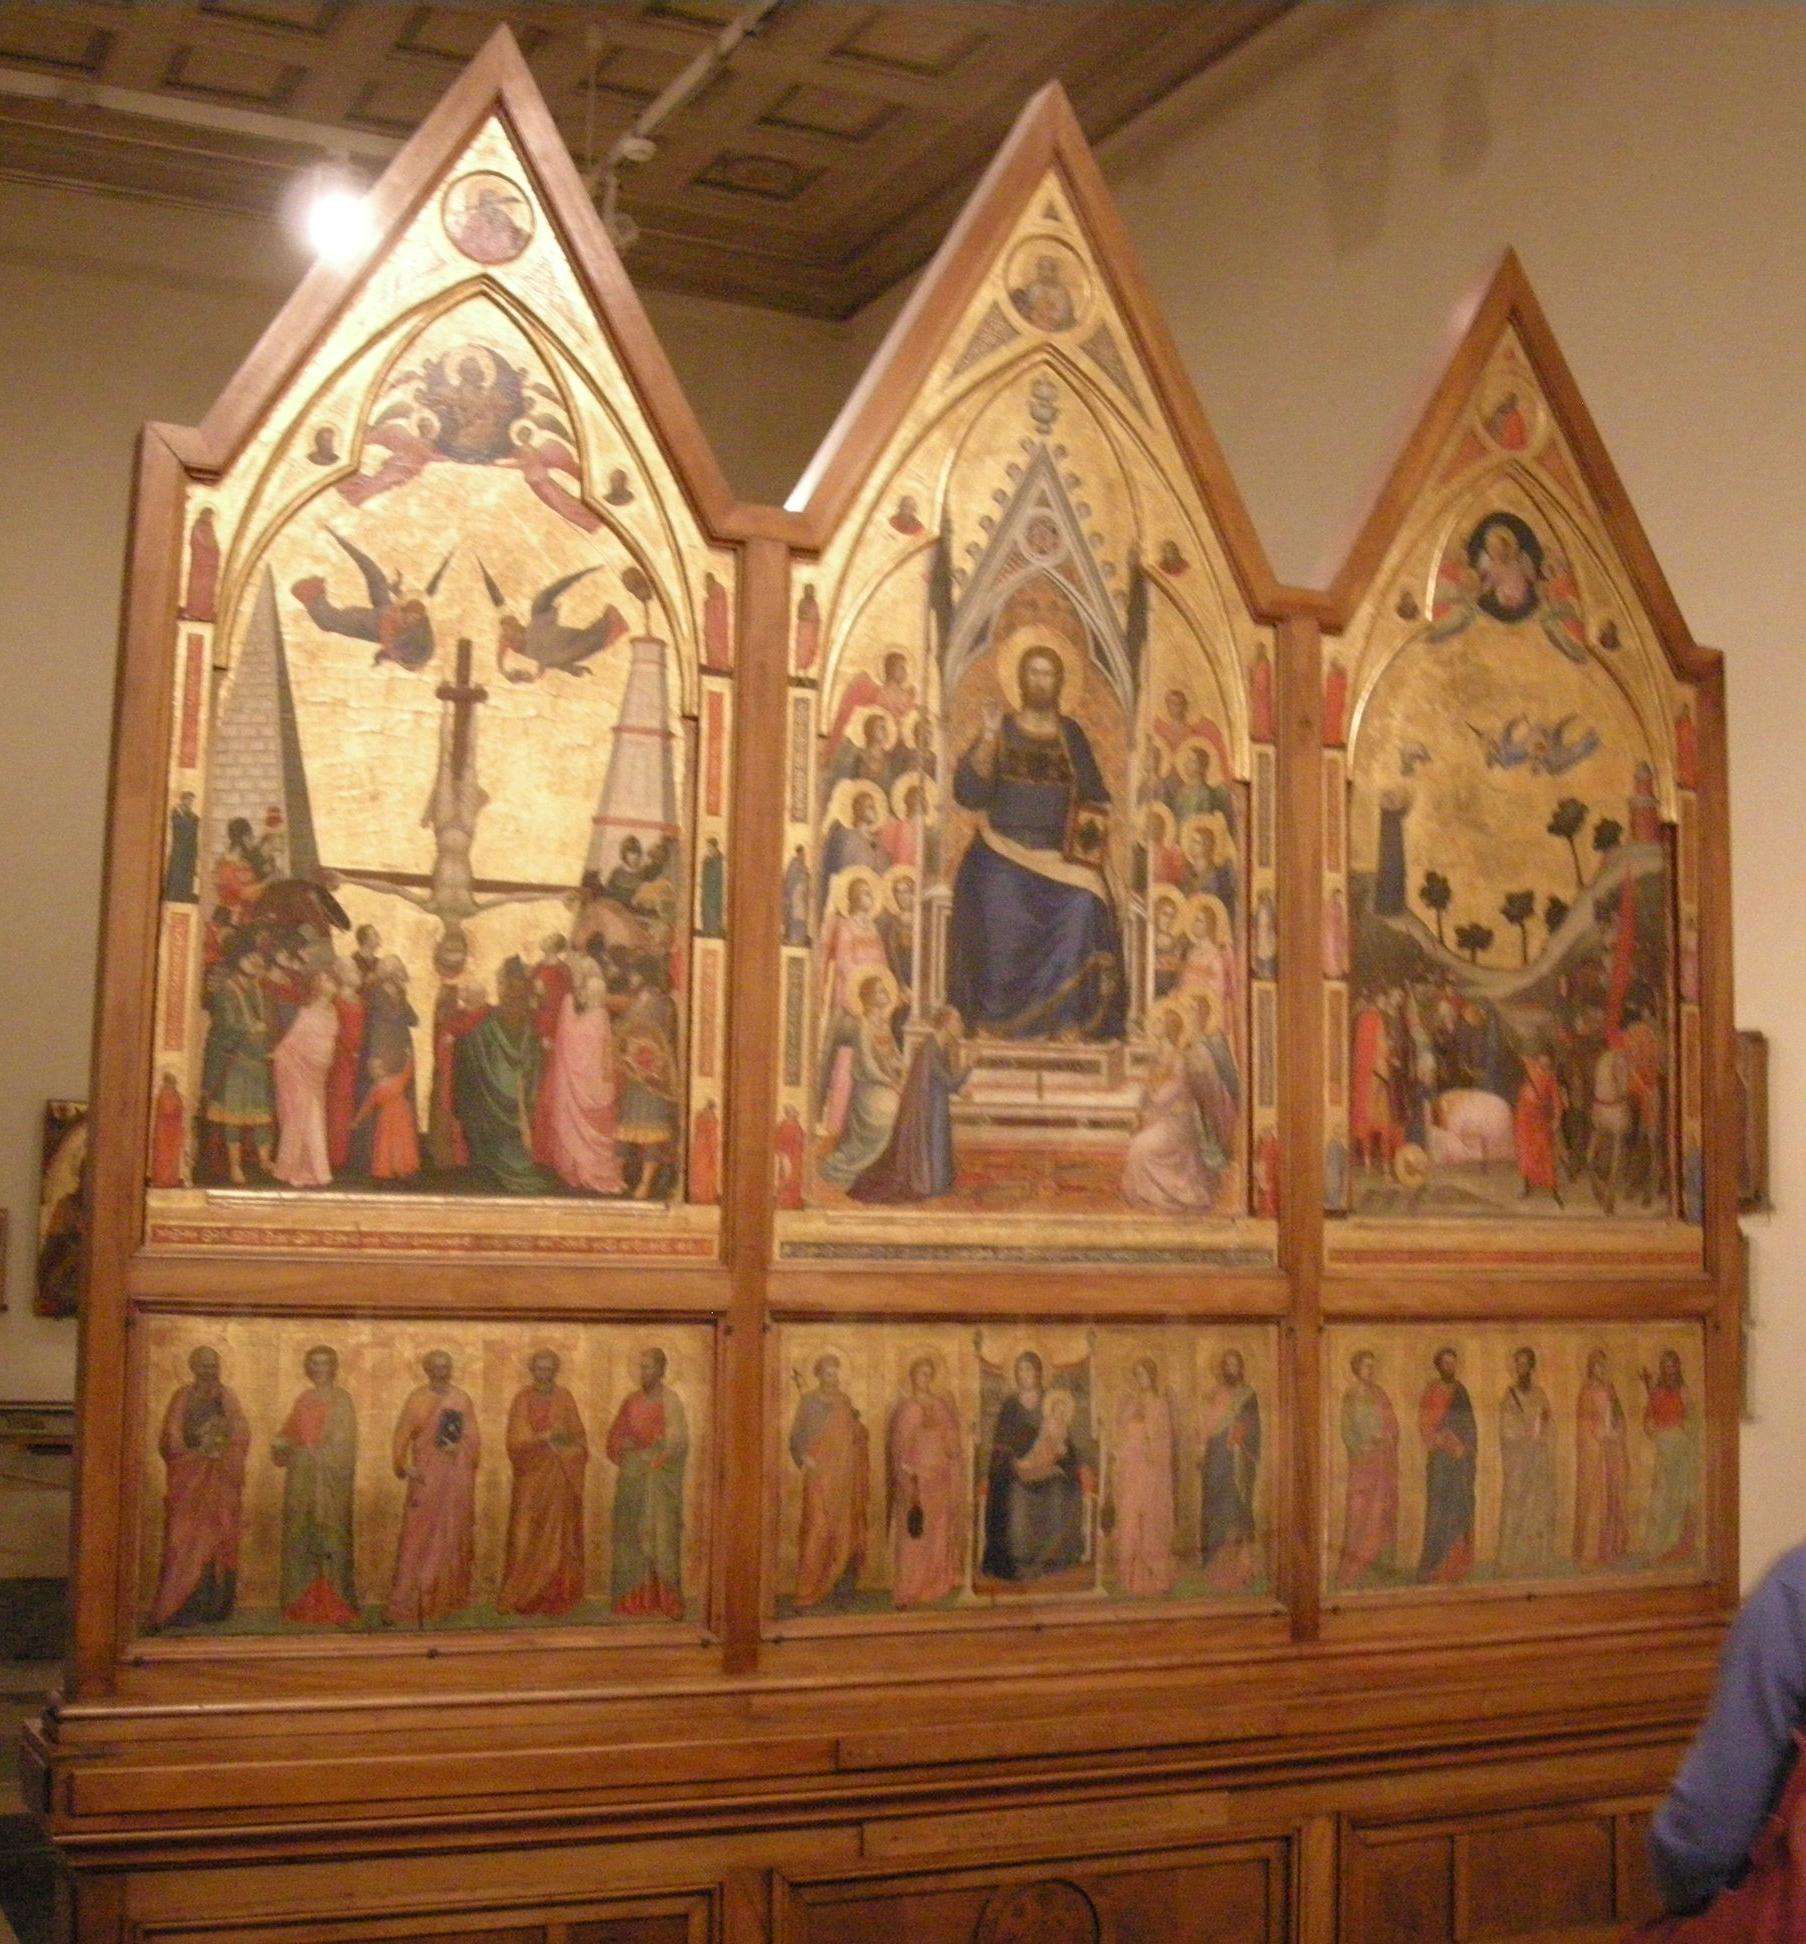 Pinacoteca Vaticana File:pinacoteca Vaticana